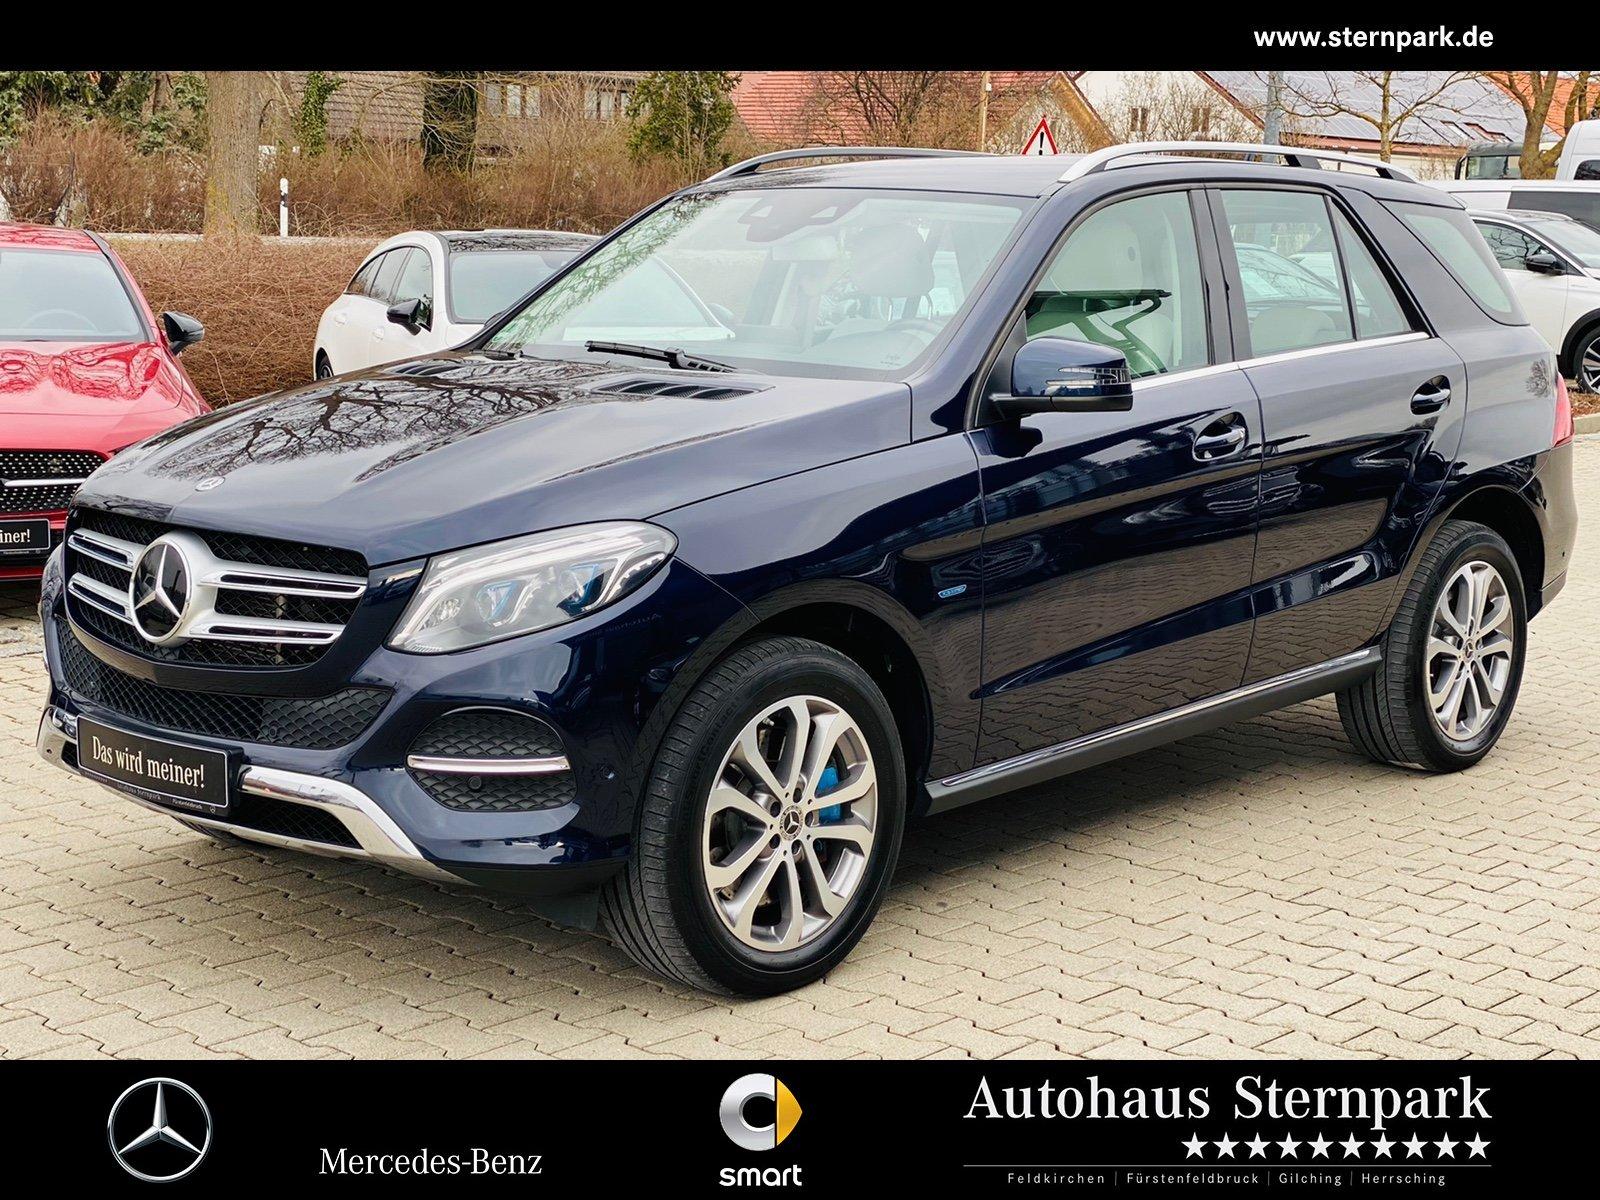 Mercedes-Benz GLE 500 e 4M Comand+AHK+DVD+LED+Distronic+Apple, Jahr 2017, Hybrid